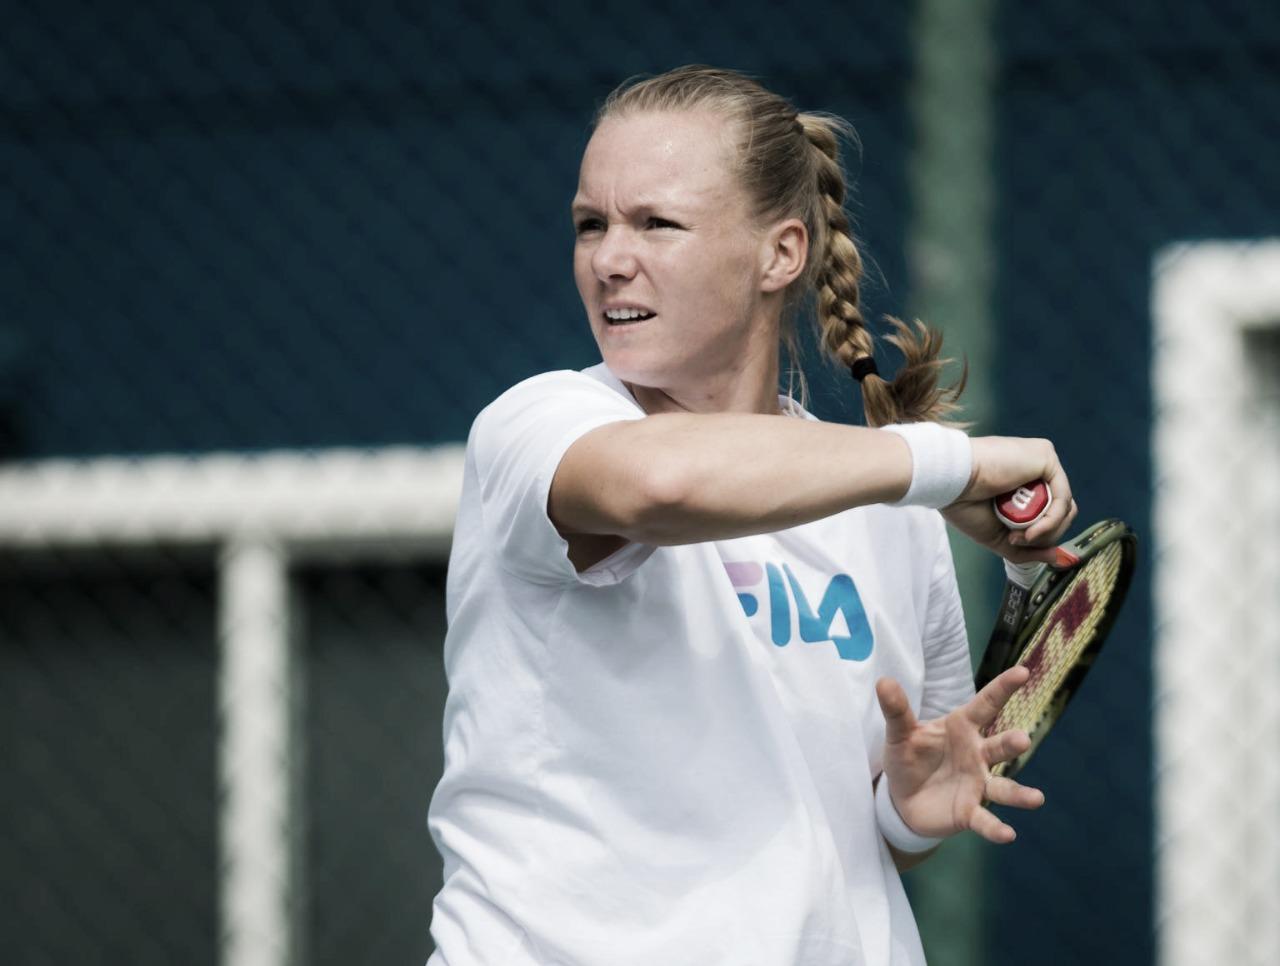 Bertens domina Linette e avança em Indian Wells